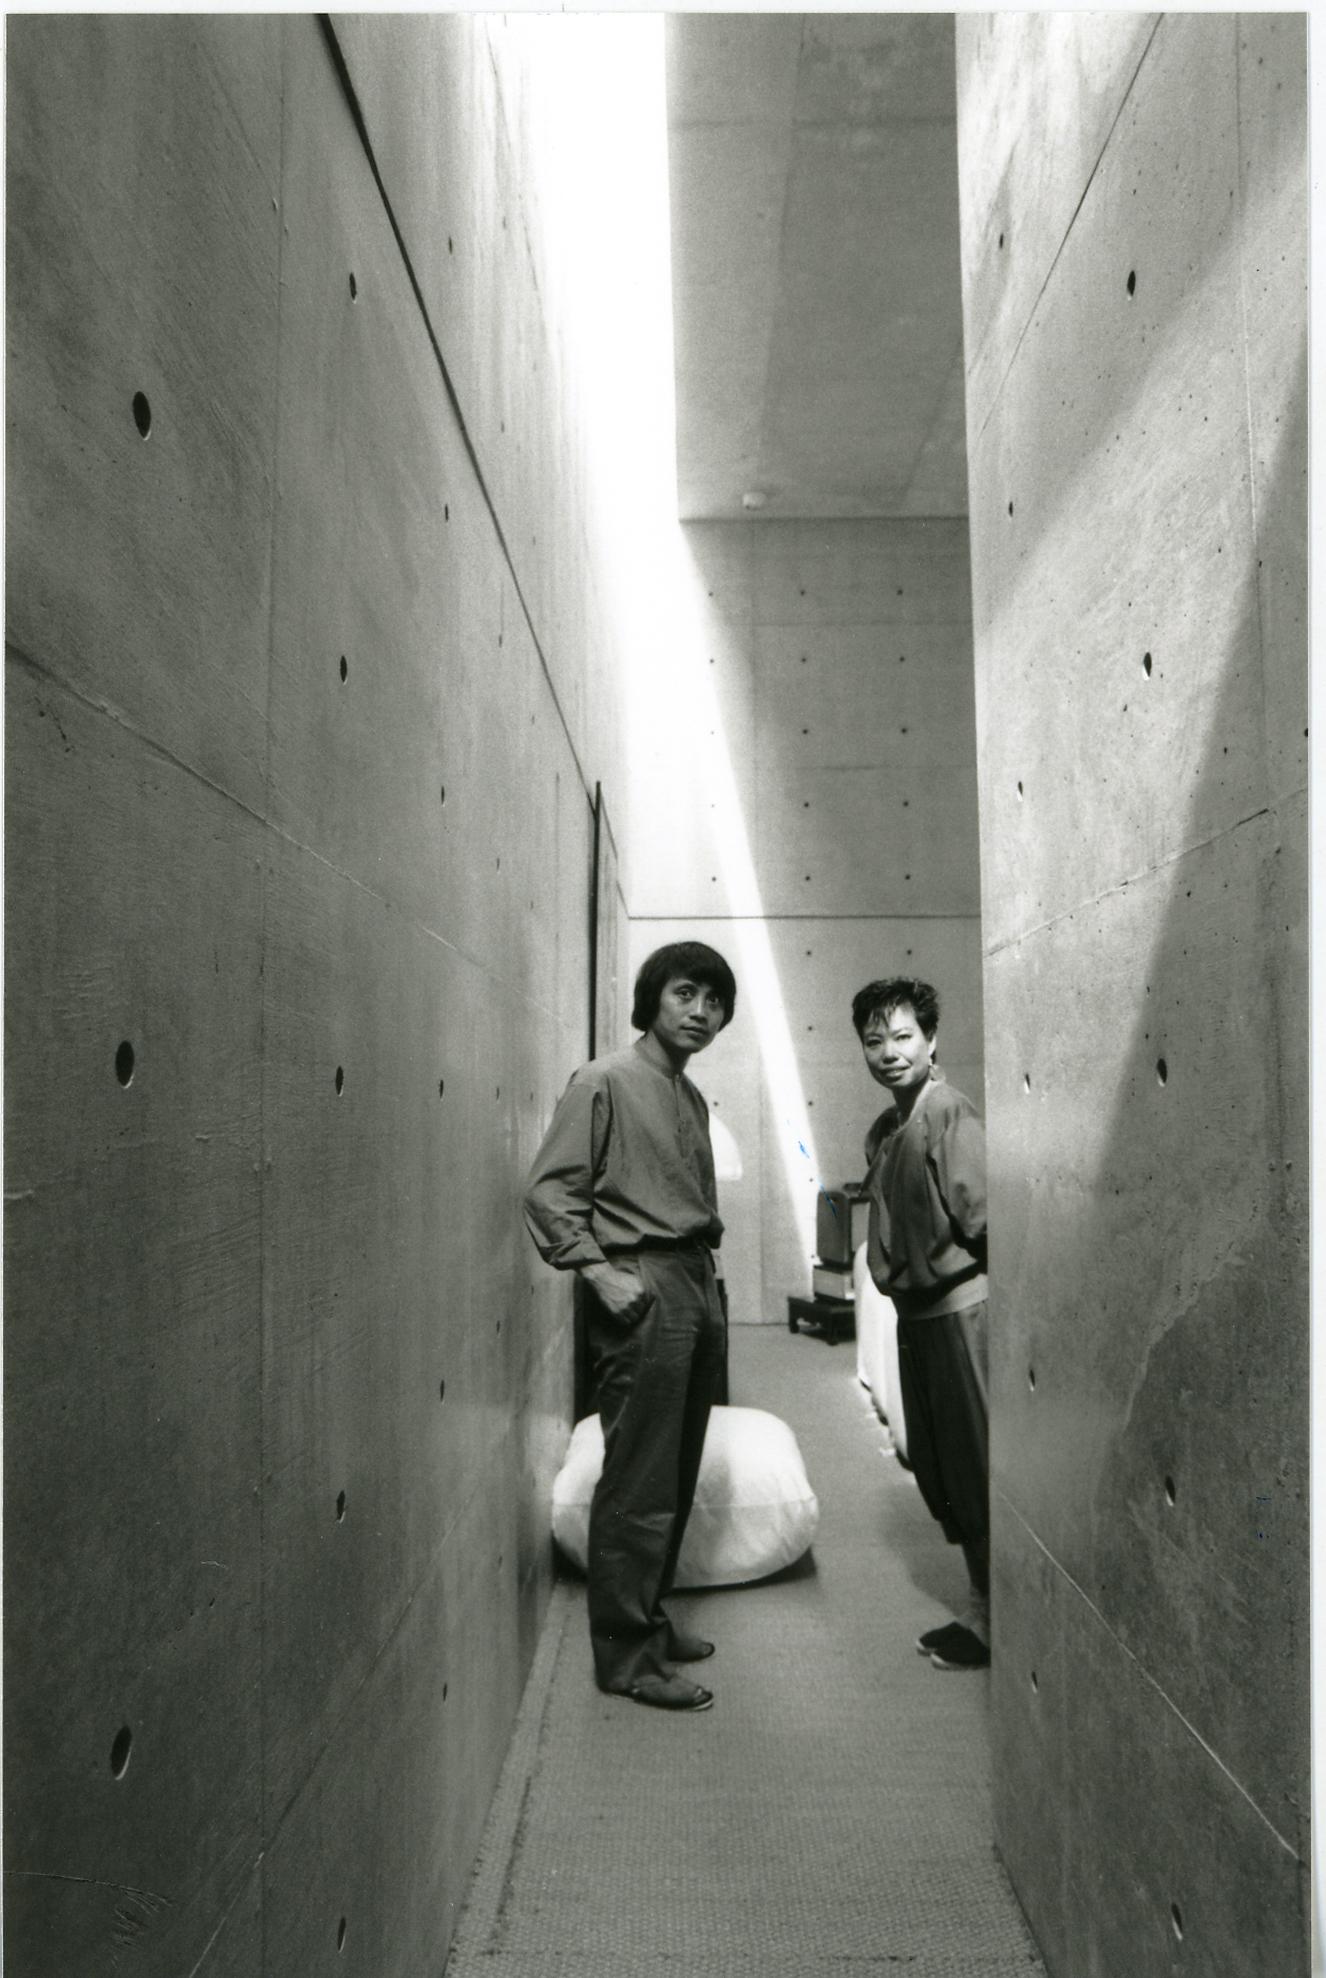 Tadao Ando and Hiroko Koshino in the Koshino House, the home he built for her. Courtesy Tadao Ando Architect & Associates.